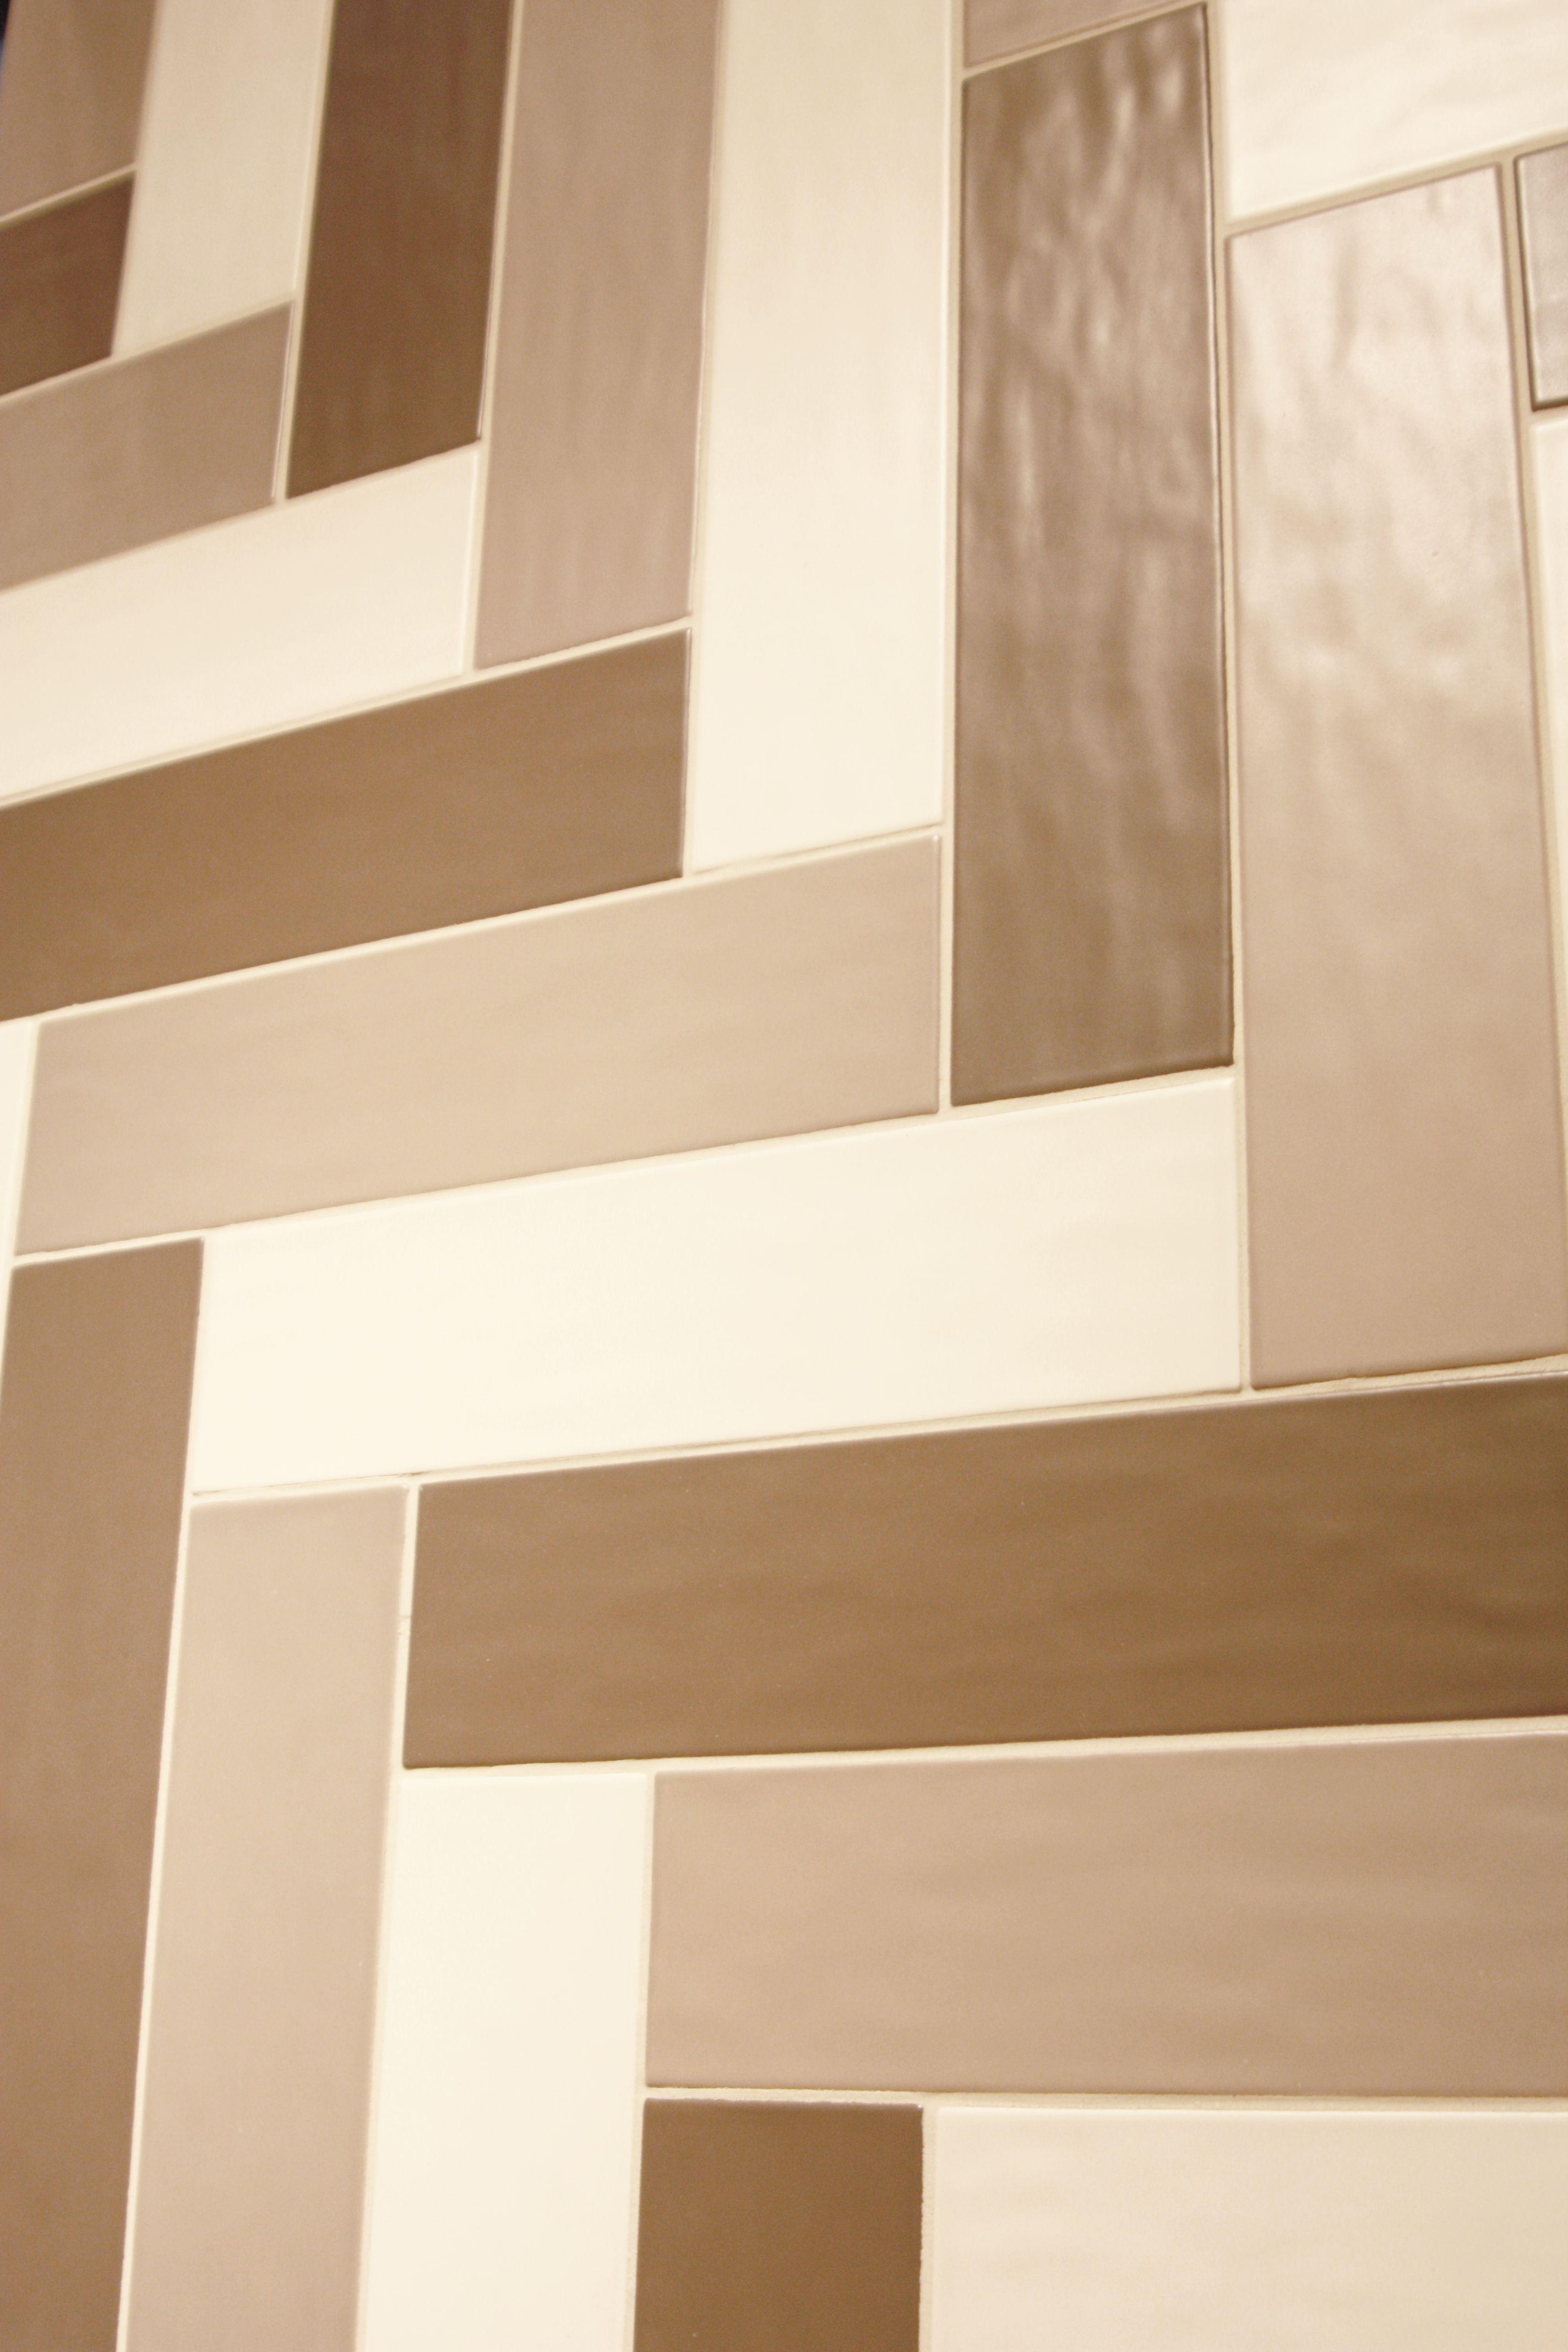 Tonalite collezione floor 40 10x40 7 colori matt tiles - Posa piastrelle ...